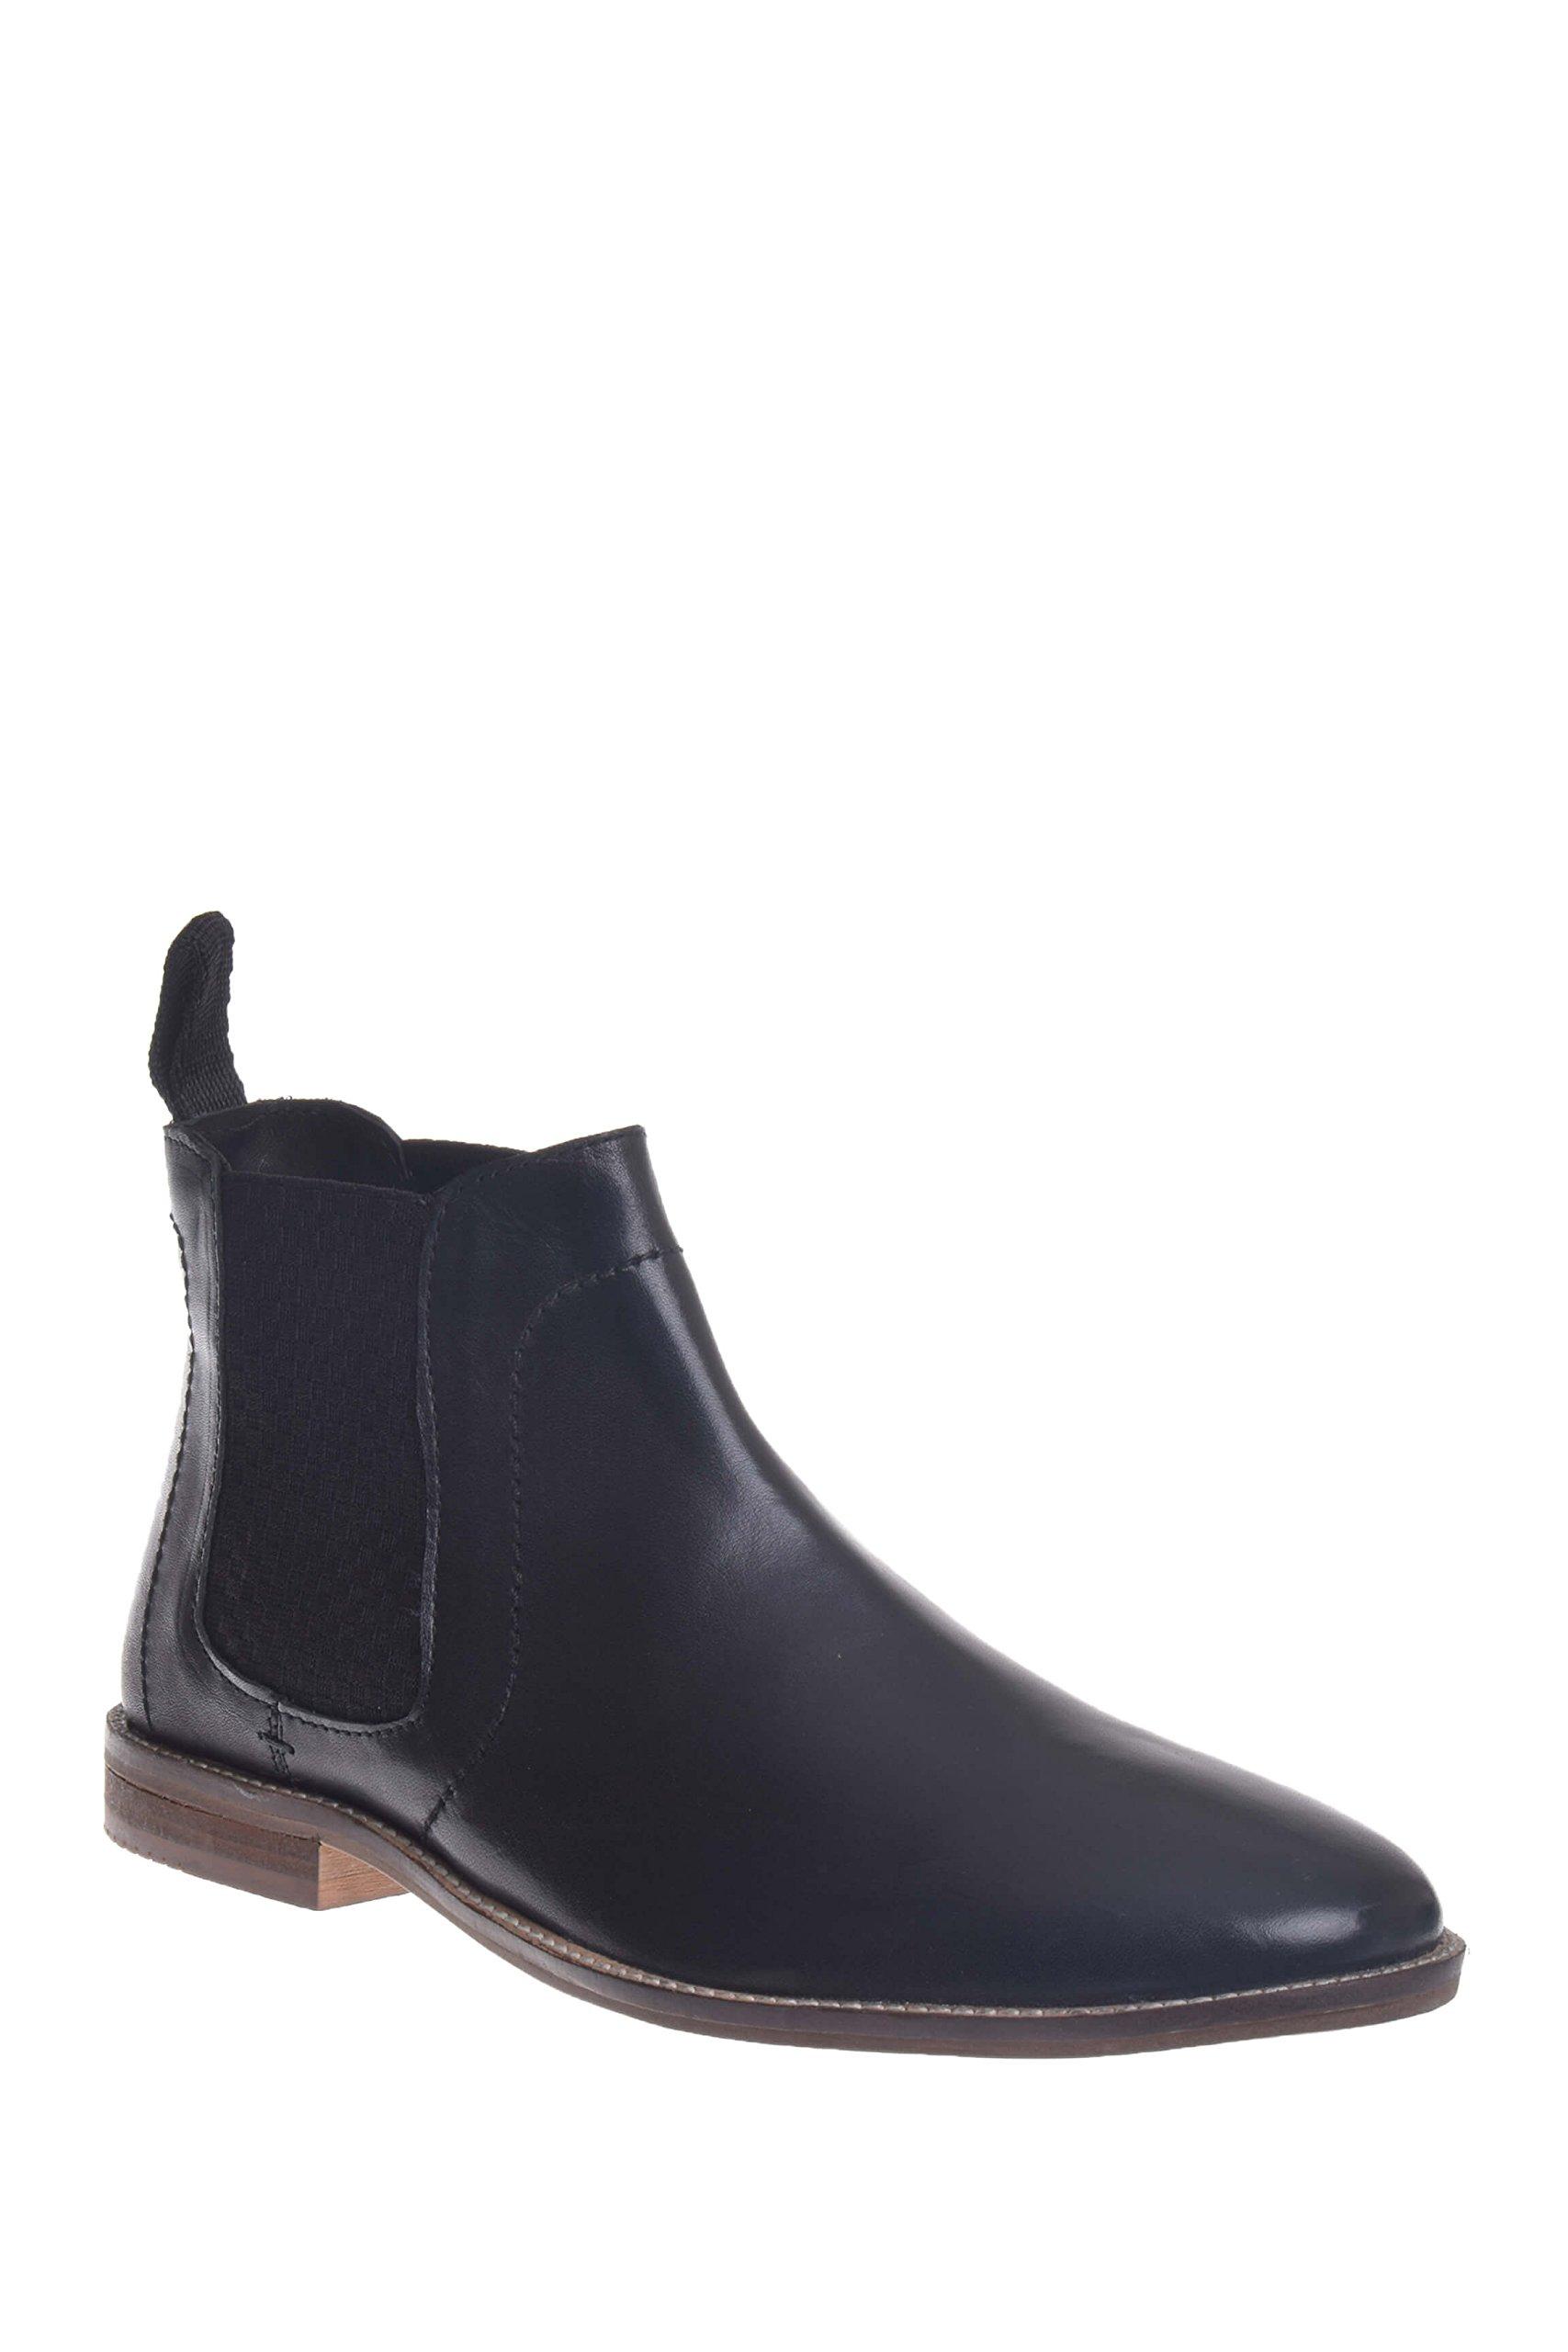 Ben Sherman Men's Gaston Chelsea Boot, Black-01A, 12 M US